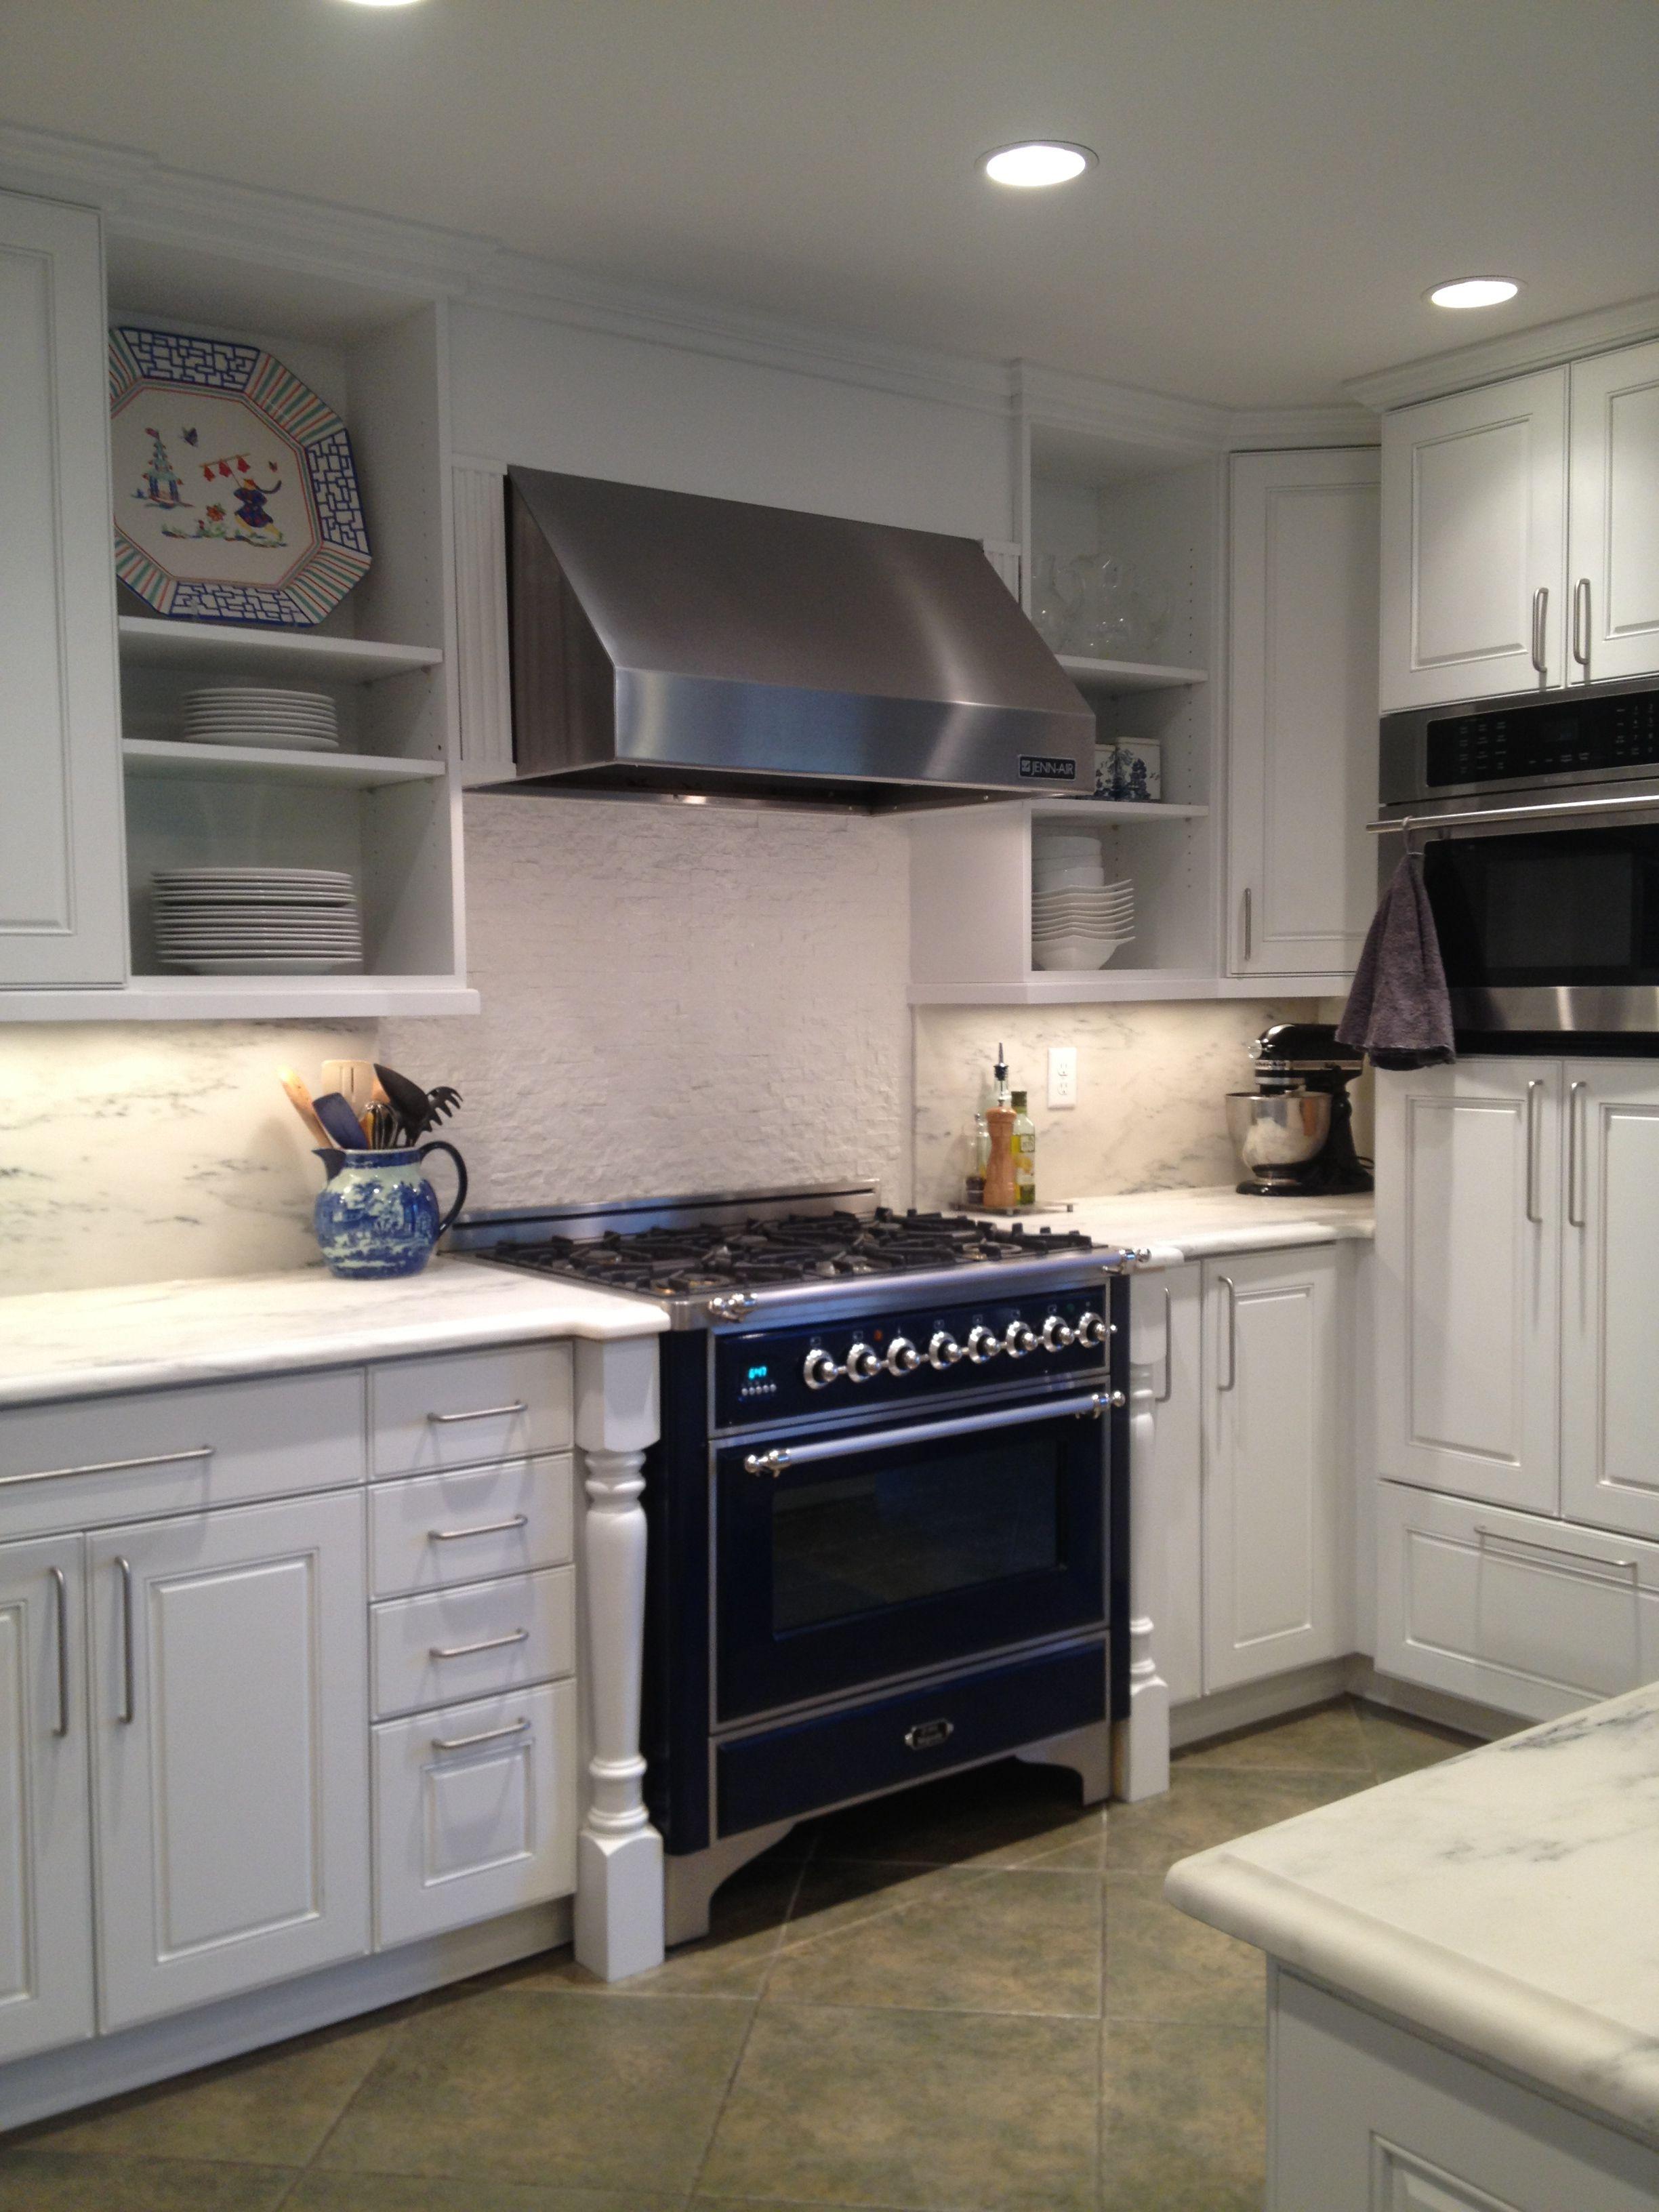 Kitchen Remodel White Marble Countertops Stone Backsplash Blue Ilve Range Kitchen Remodel Design Kitchen Design Decor Small Kitchen Decor